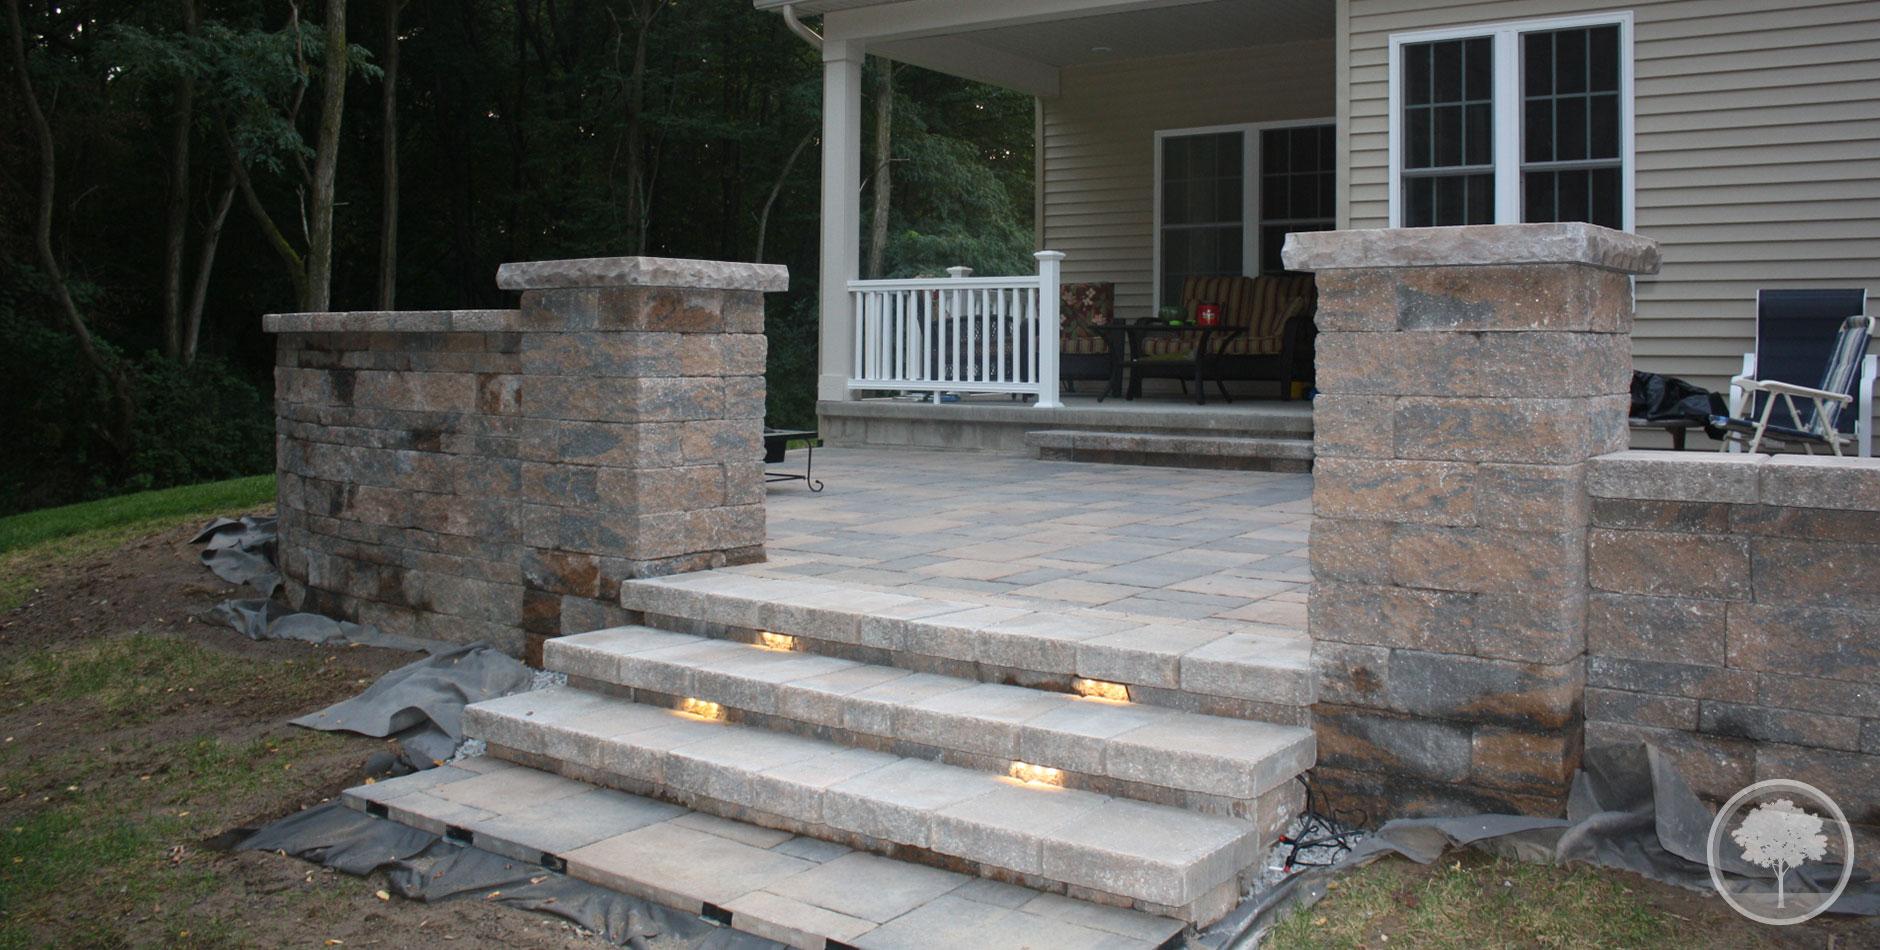 LaShomb Lawn & Landscape Patio - Steps - Lighting - Walls ... on Backyard Patio Steps id=84084